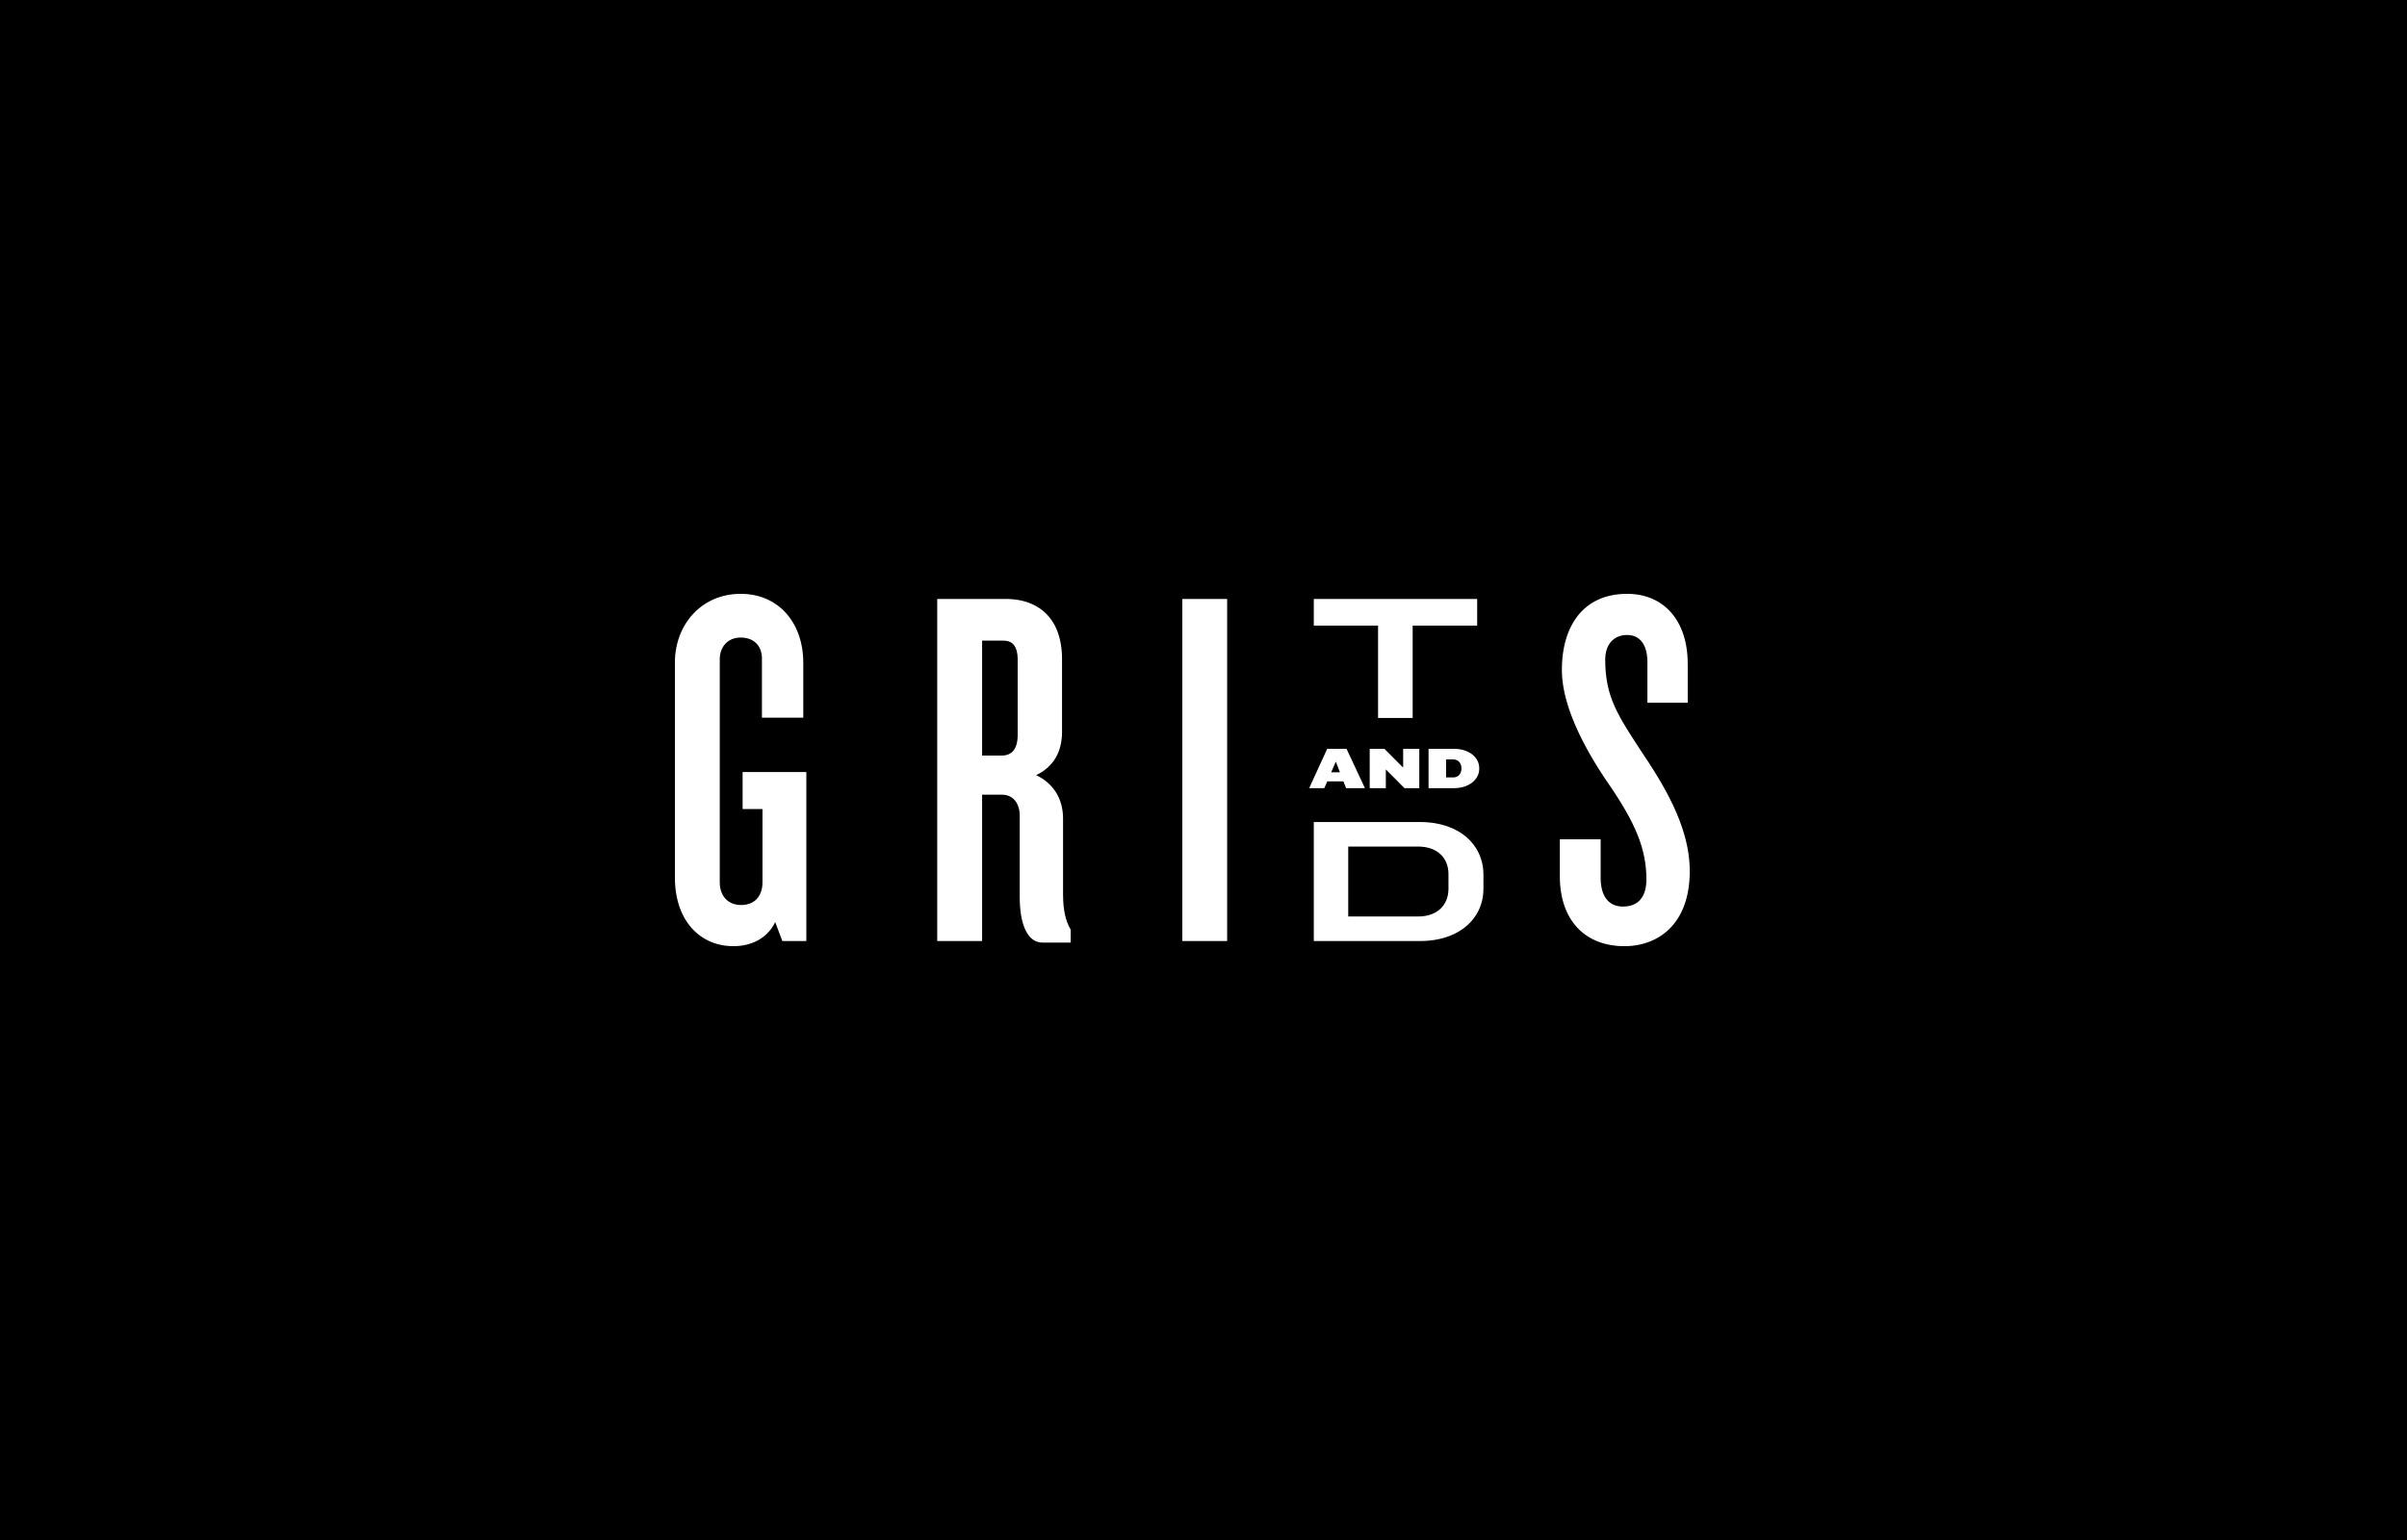 Tio Joe on Grits and Grids